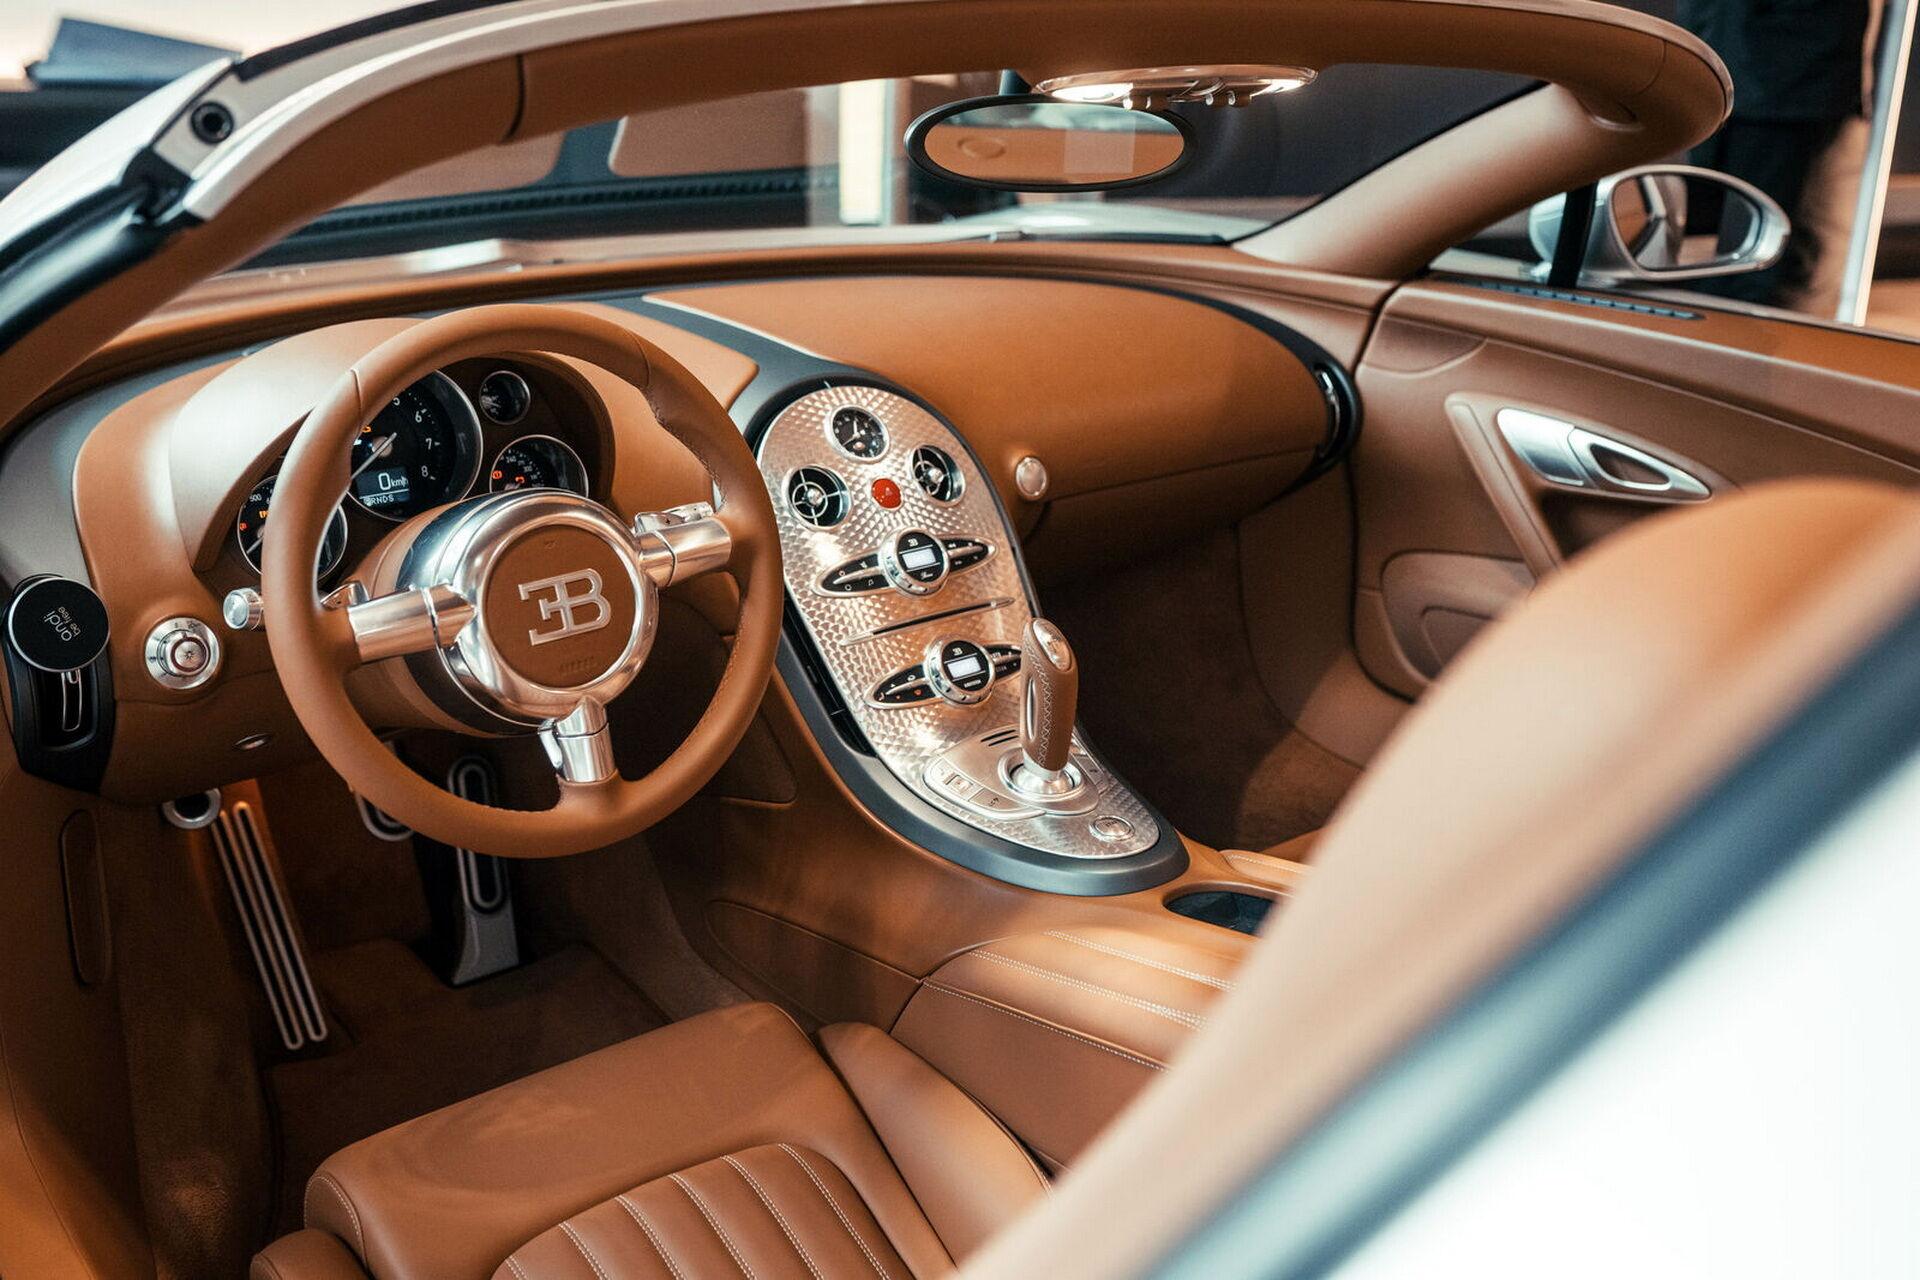 Салон прототипу Veyron 16.4 Grand Sport